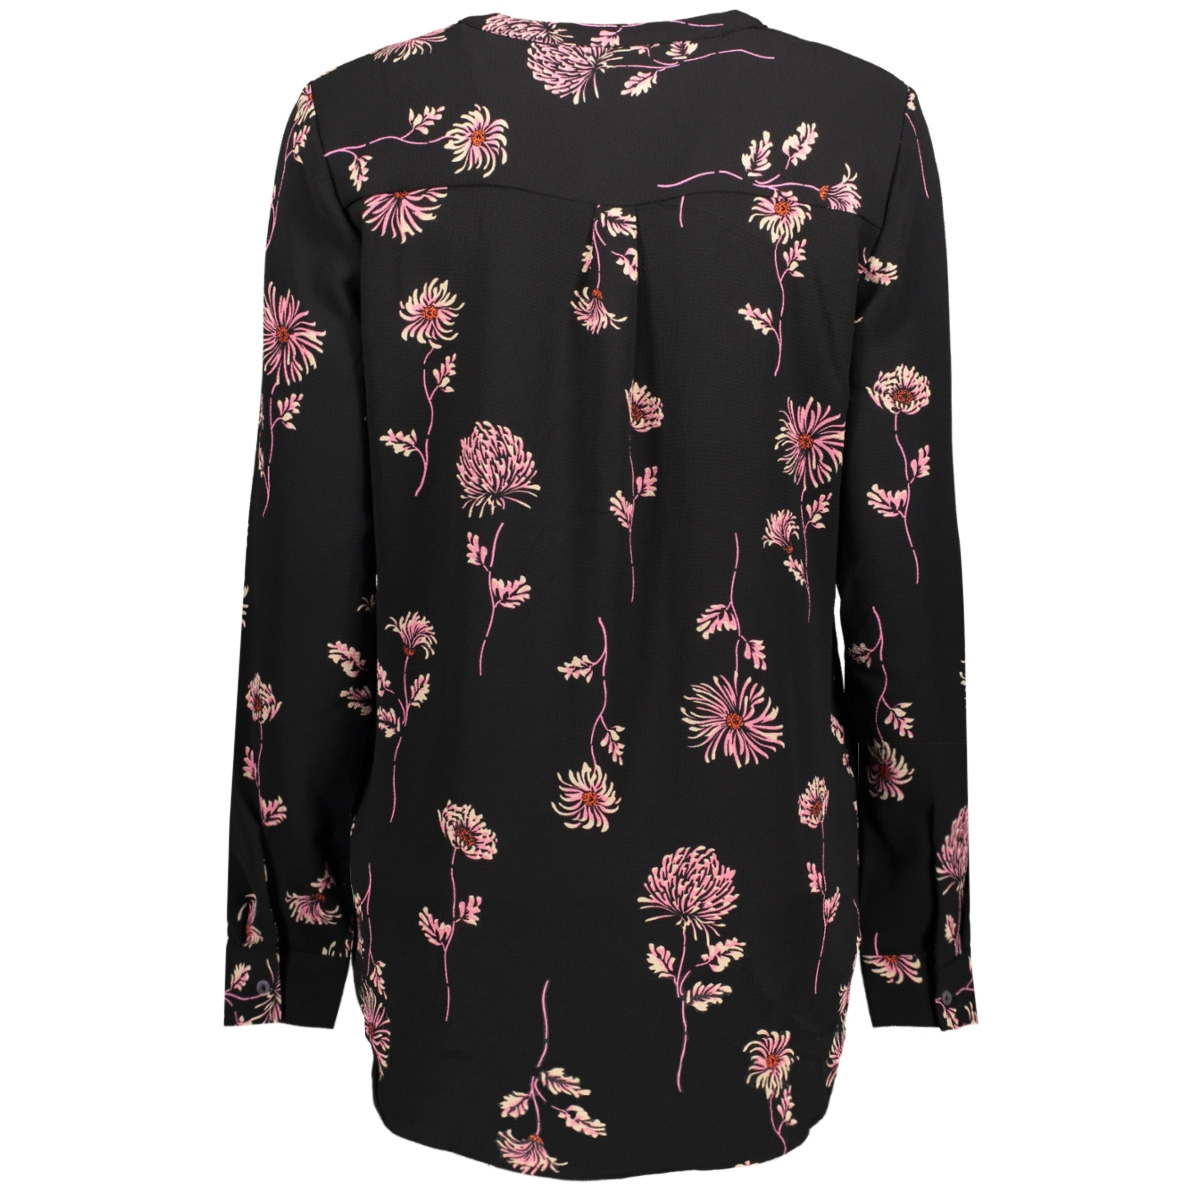 jdyrun l/s placket blouse wvn 15143222 jacqueline de yong blouse black/run small